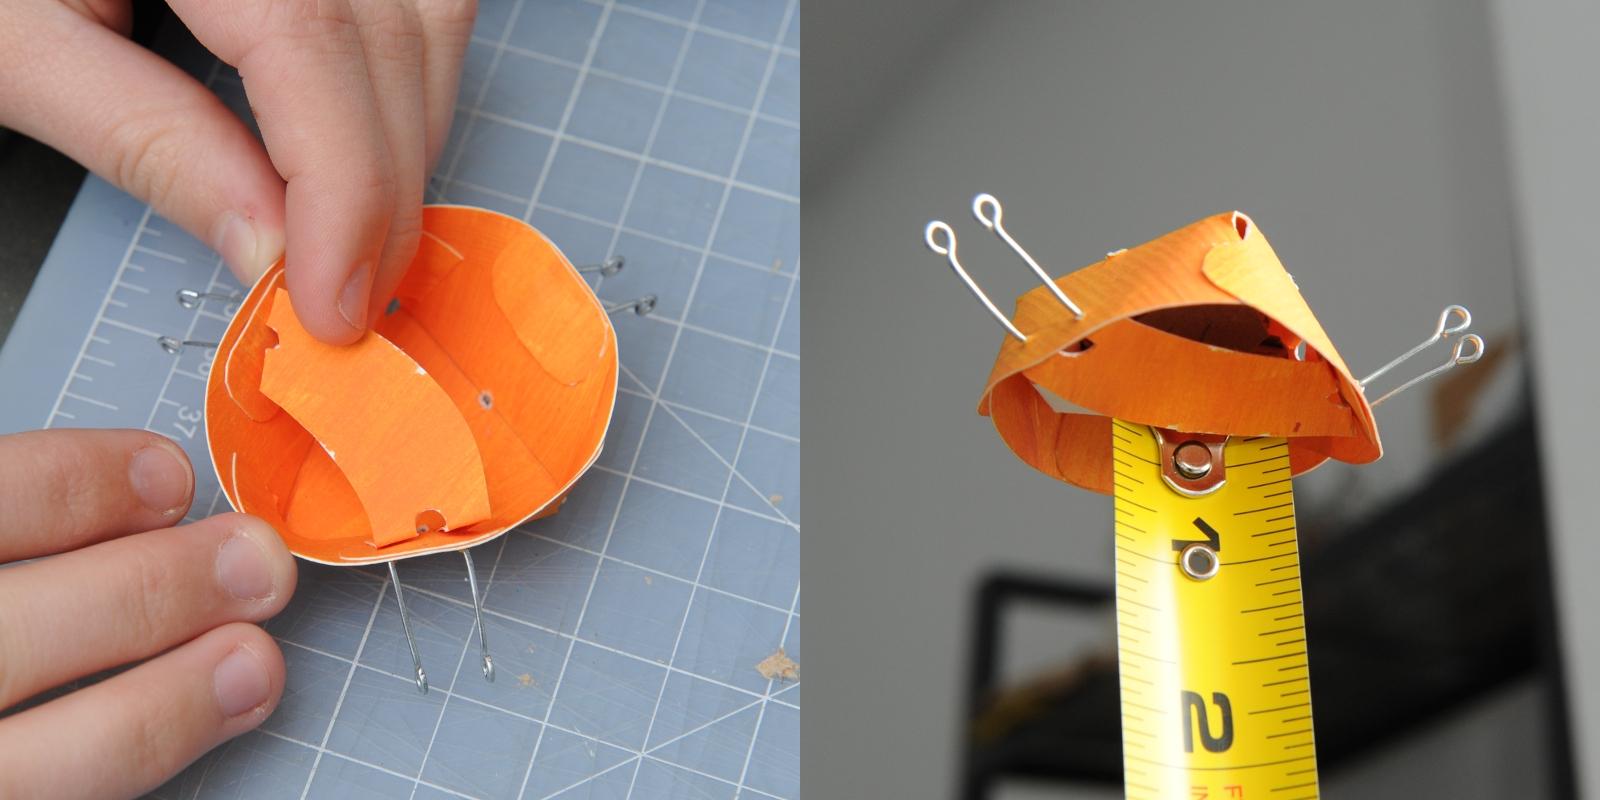 Make It Last Build Series: Papercraft flower